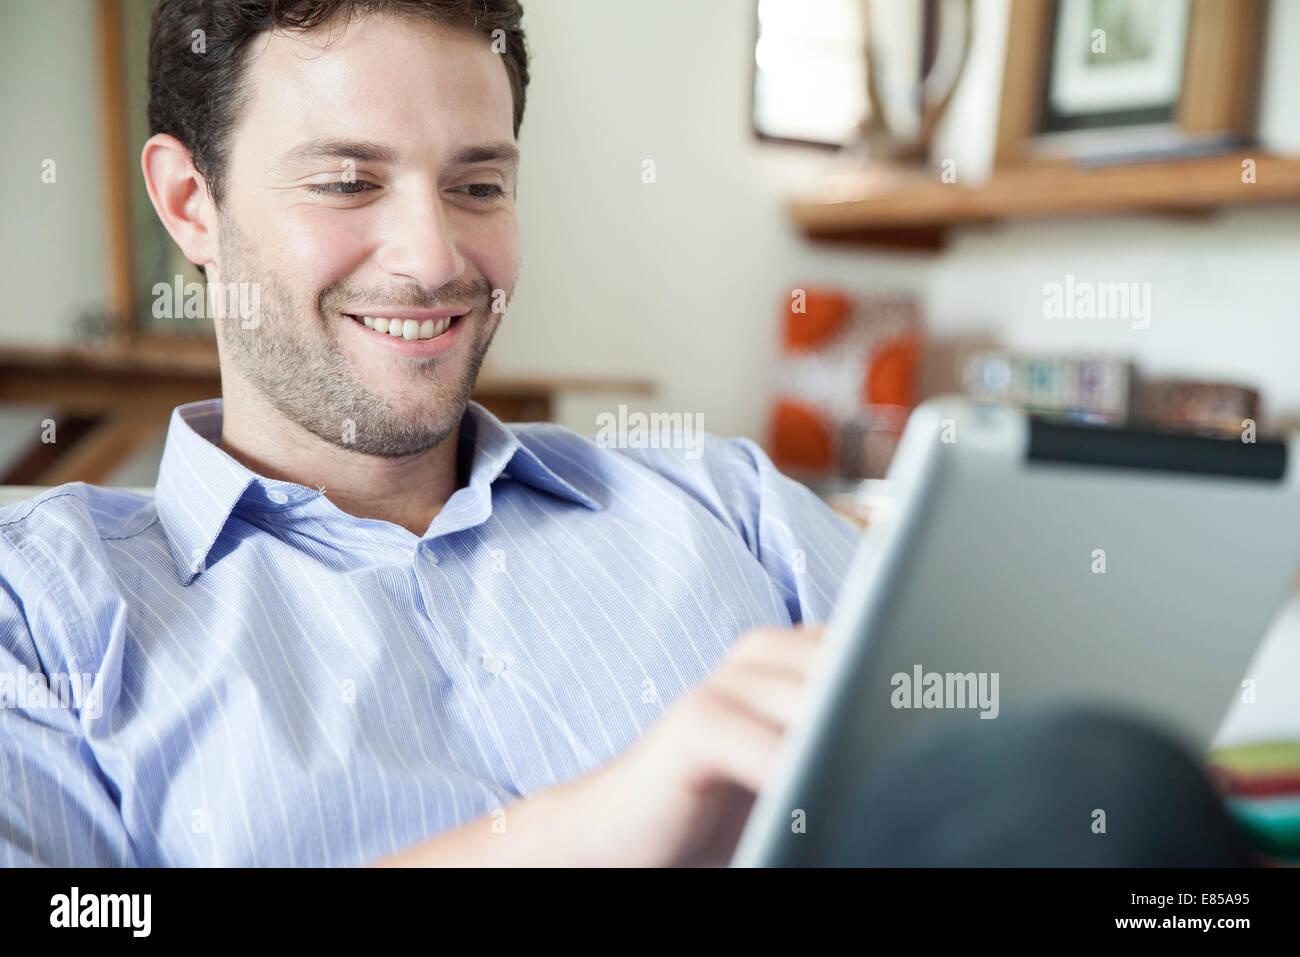 Man using digital tablet Photo Stock